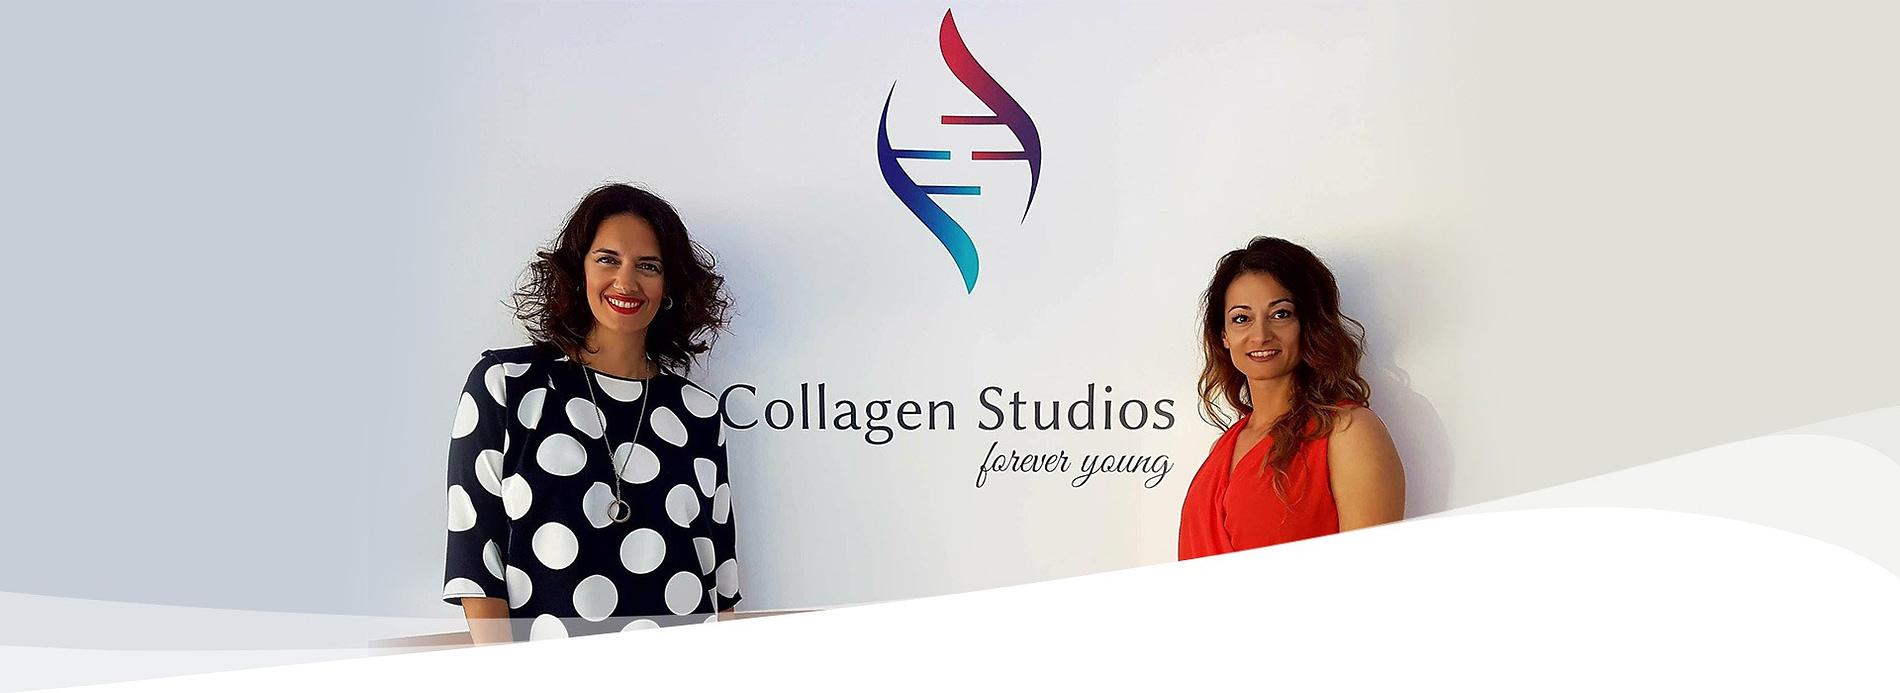 collagen Studio